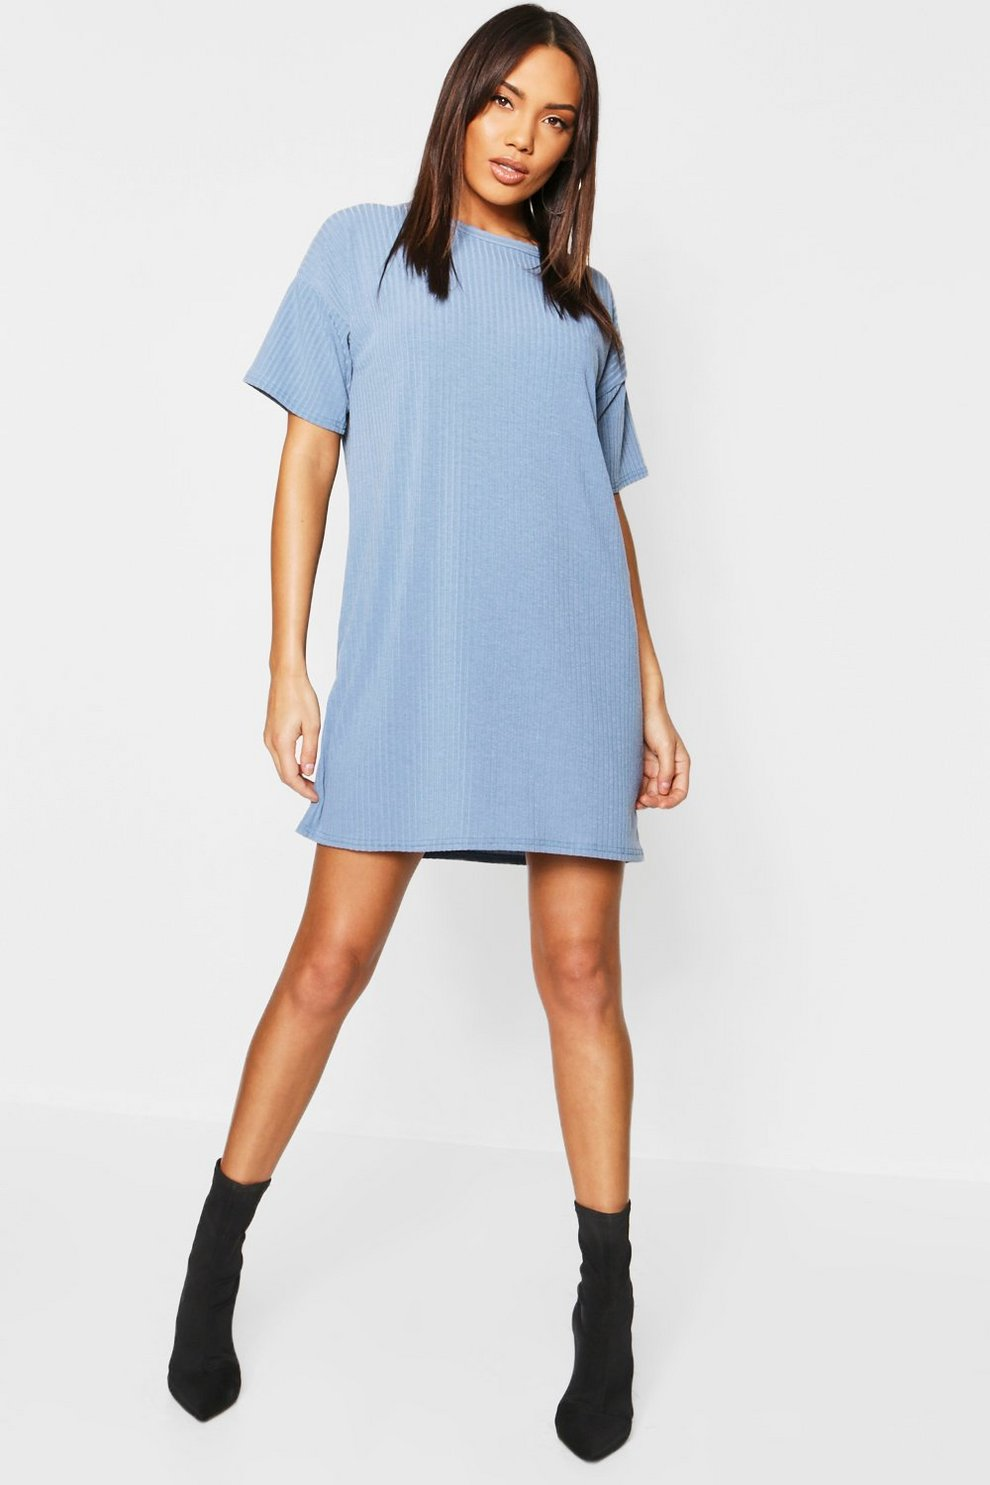 Oversized Rib Knit T Shirt Dress Boohoo